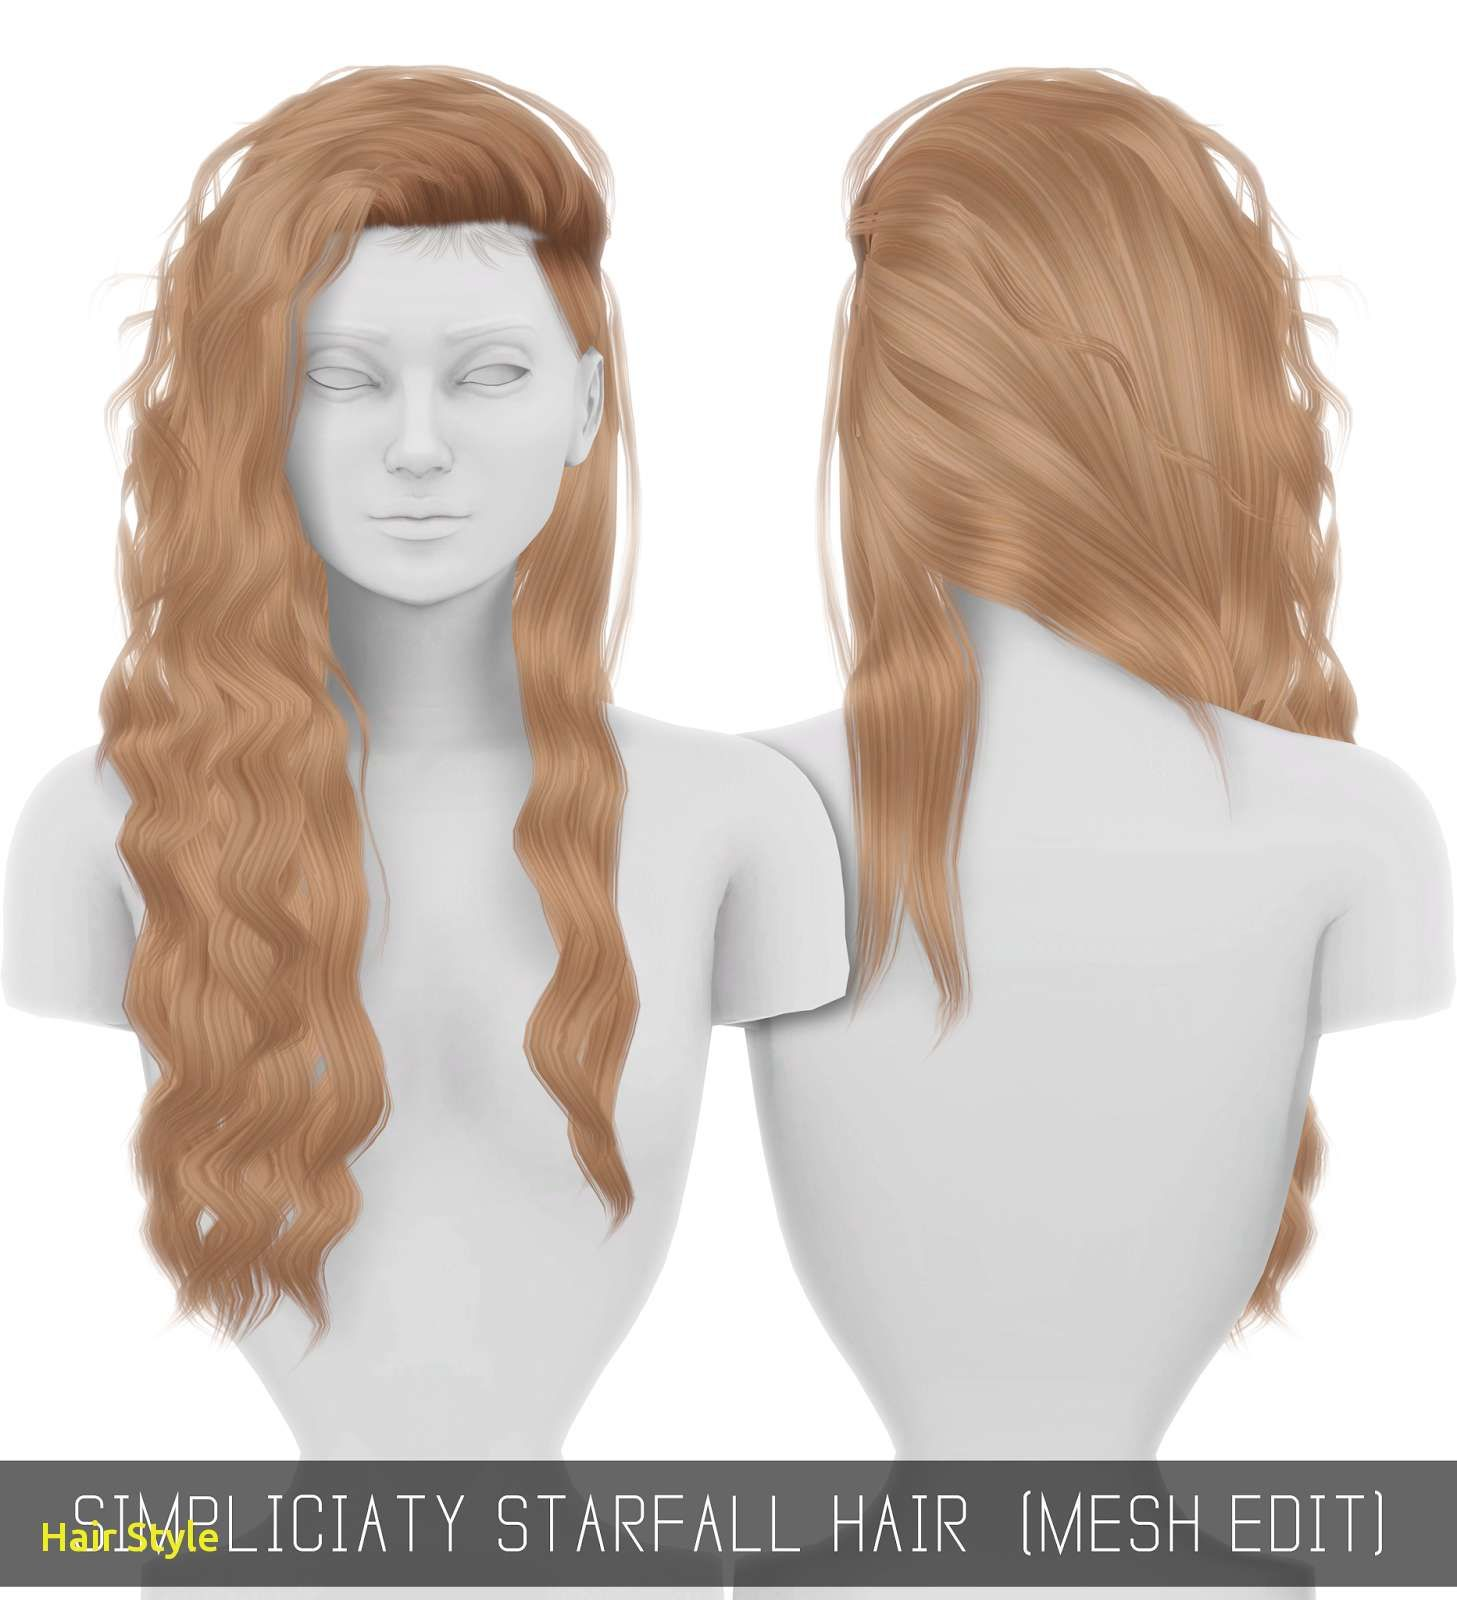 Super Die Sims 4 Hairline Sims 4 Sims 4 Sims 4 Teen Sims 4 Mods